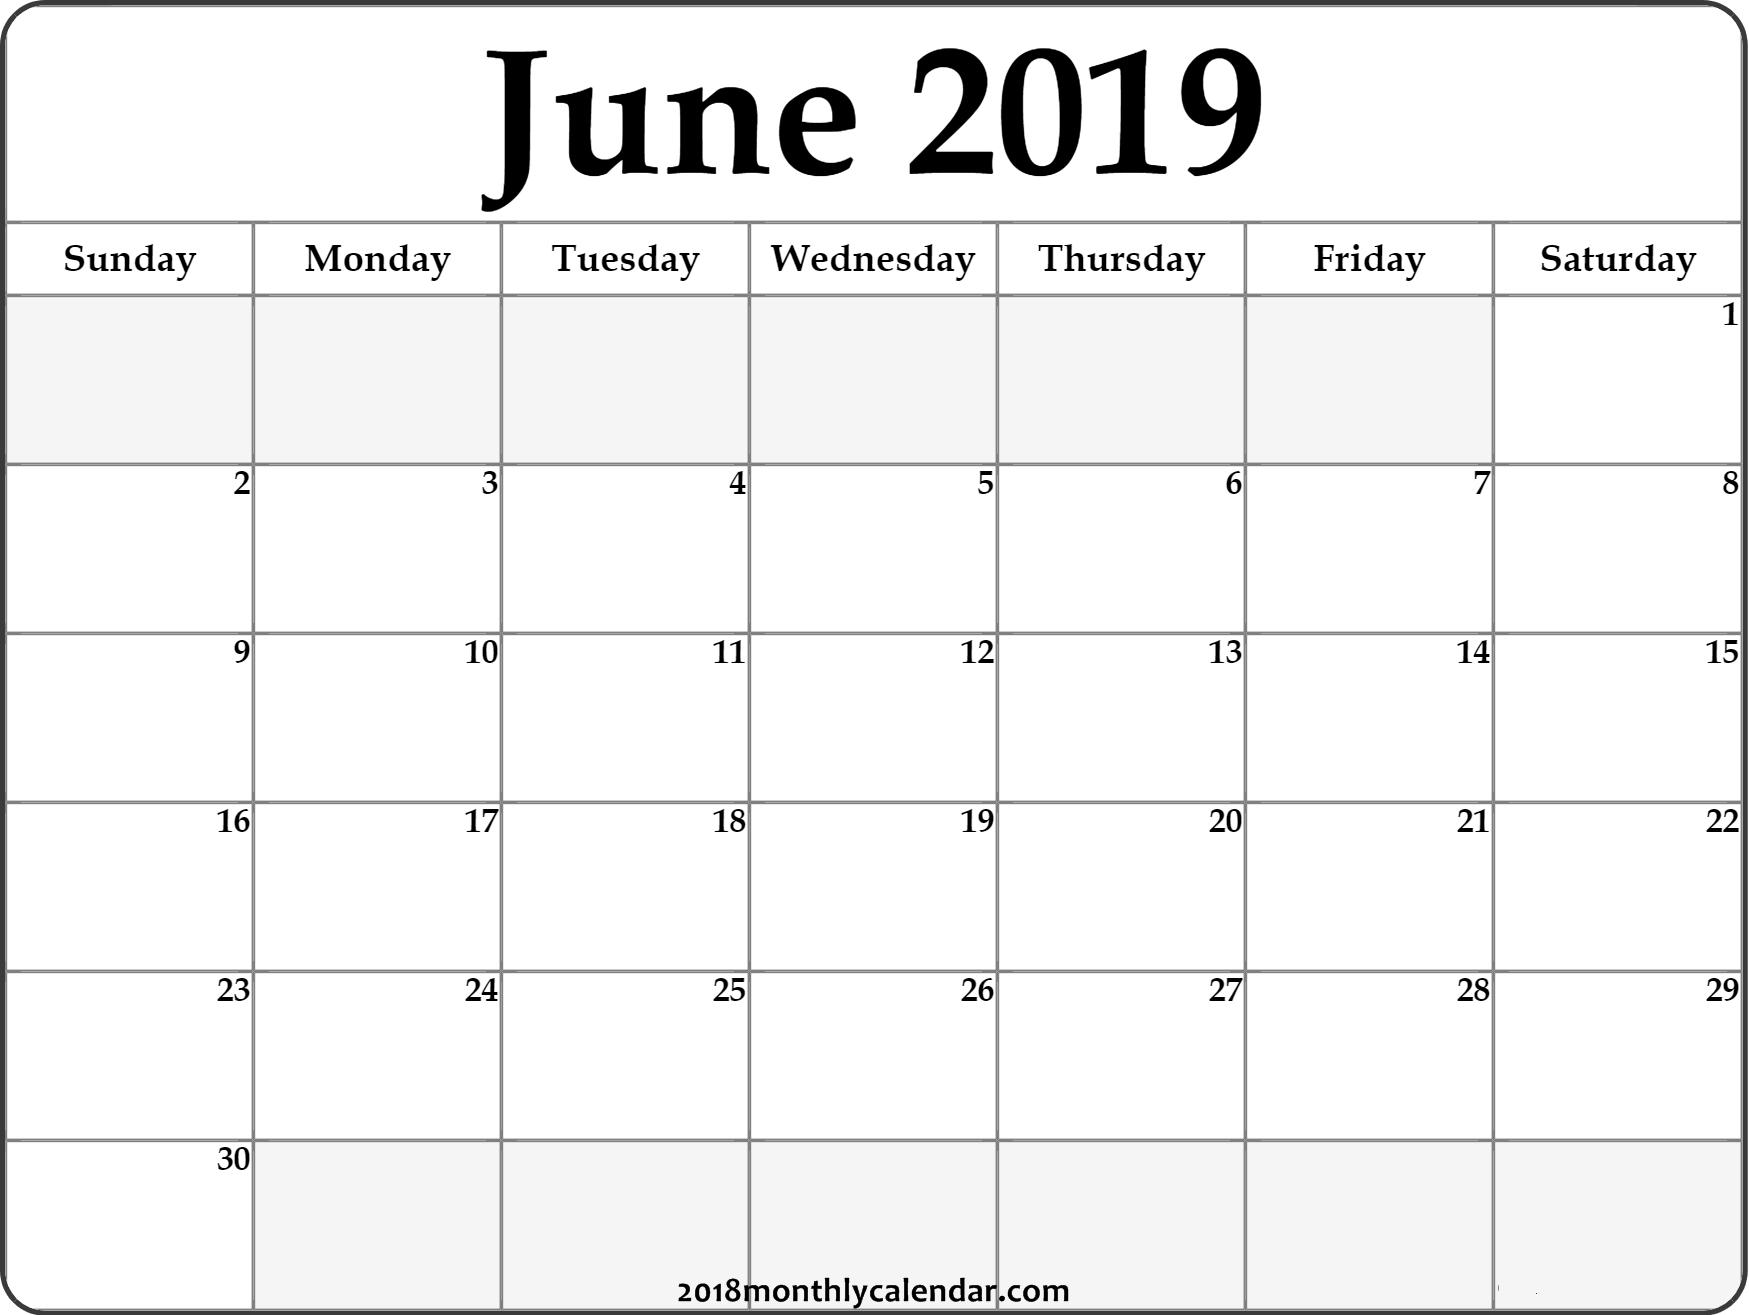 June Calendar 2019 #june #2019Calendar #june2019 #junecalendar for Blank Printable Calendar Free